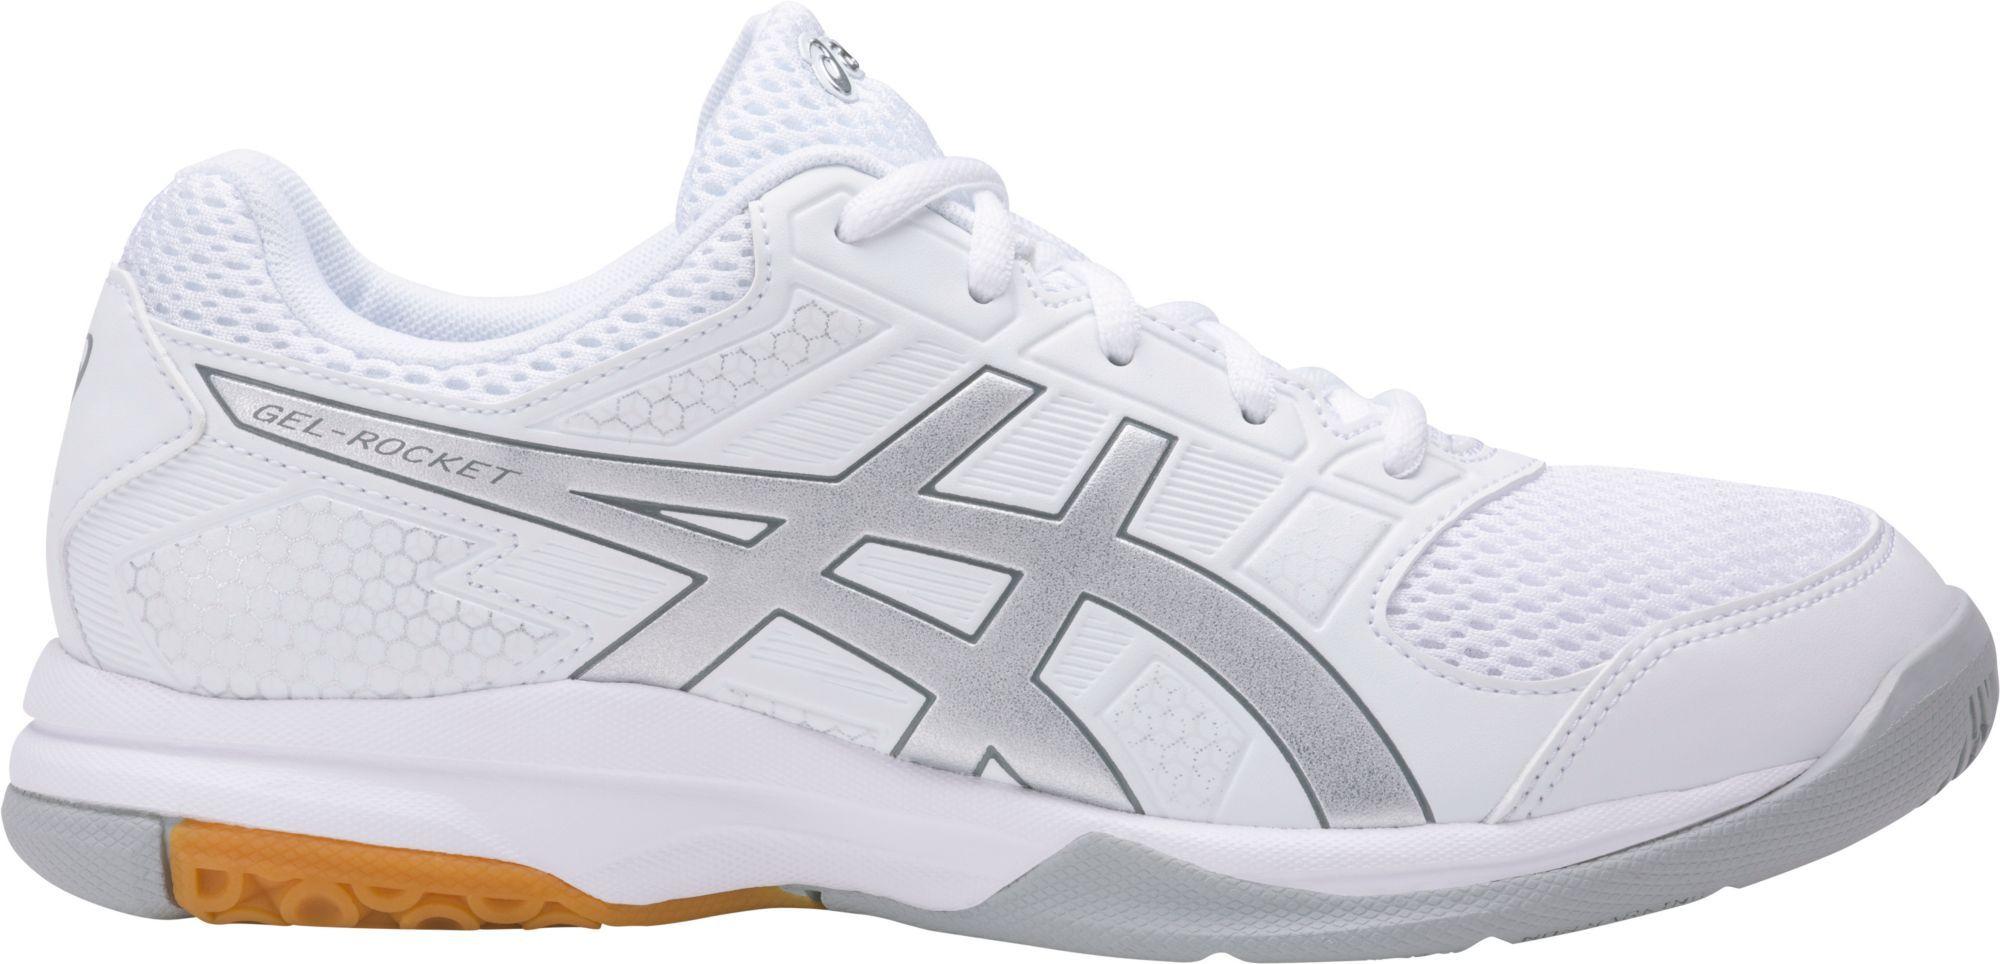 Asics Women S Gel Rocket 8 Volleyball Shoes Size 13 0 White Volleyball Shoes Asics Asics Women